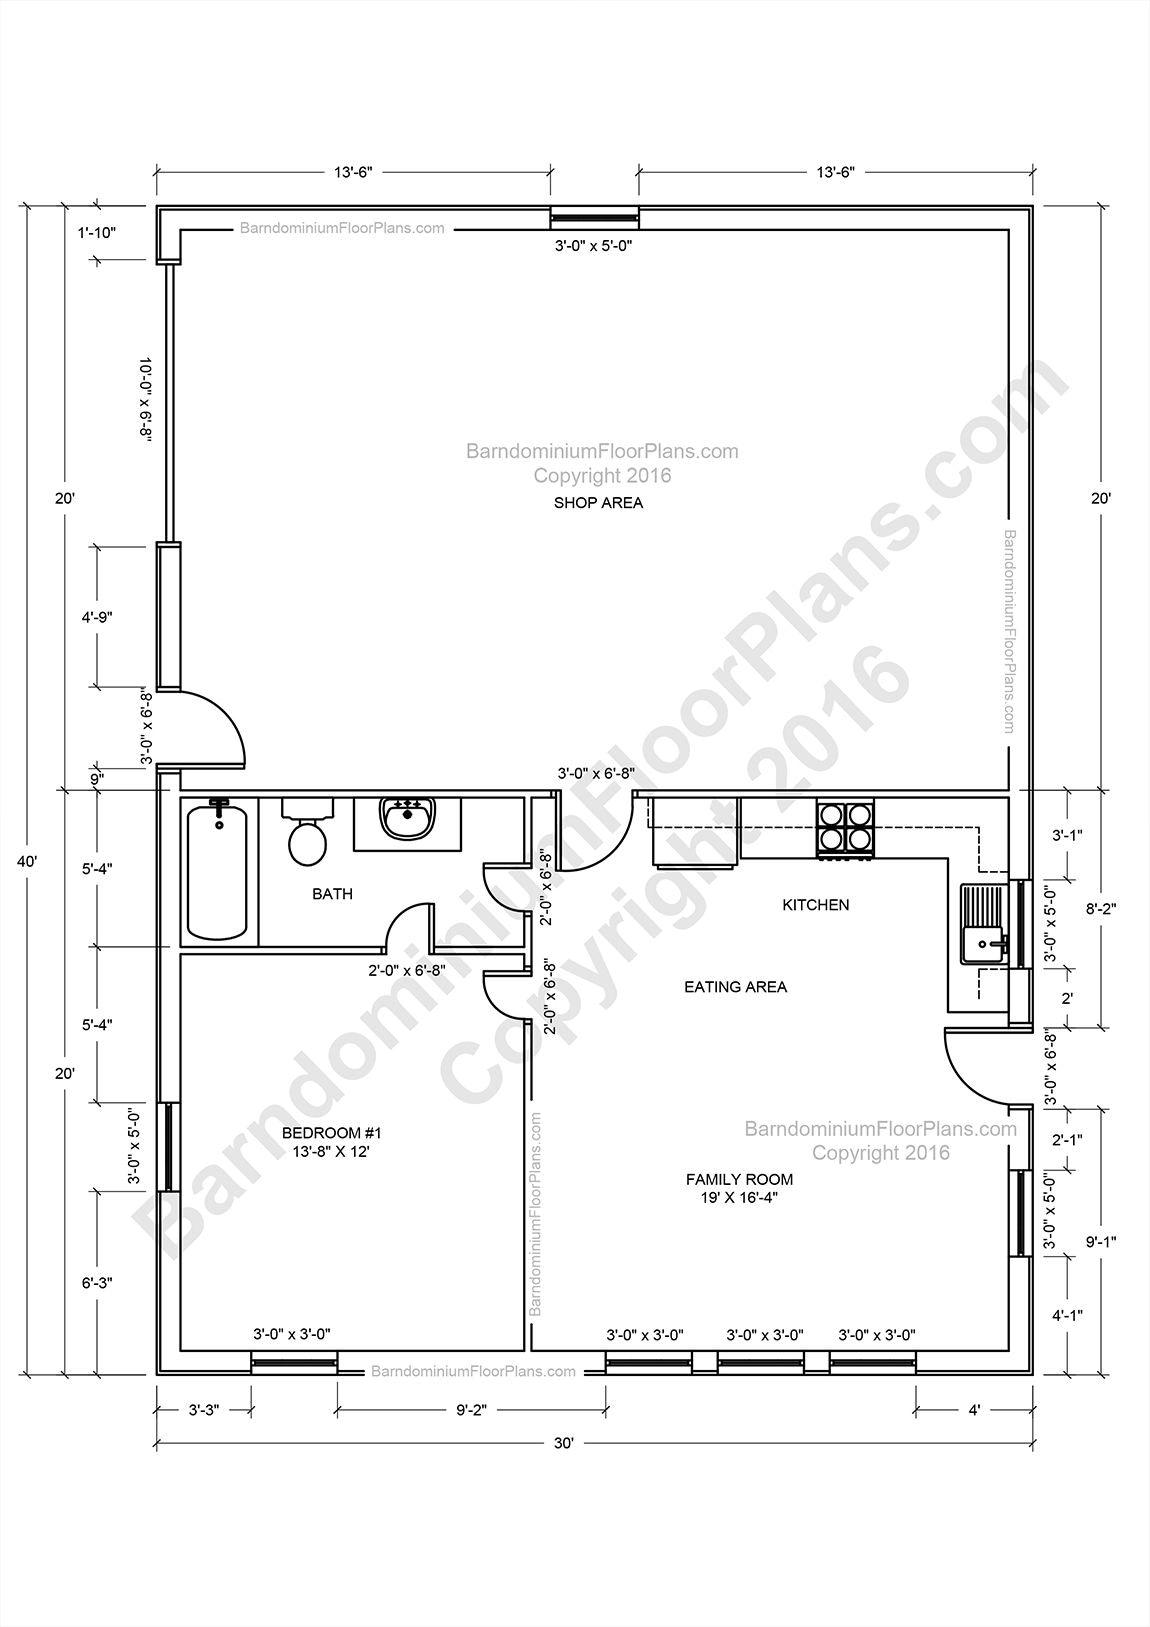 Barndominium Floor Plans, Pole Barn House Plans And Metal with regard to Barndominium Floor Plans 5 Bedroom